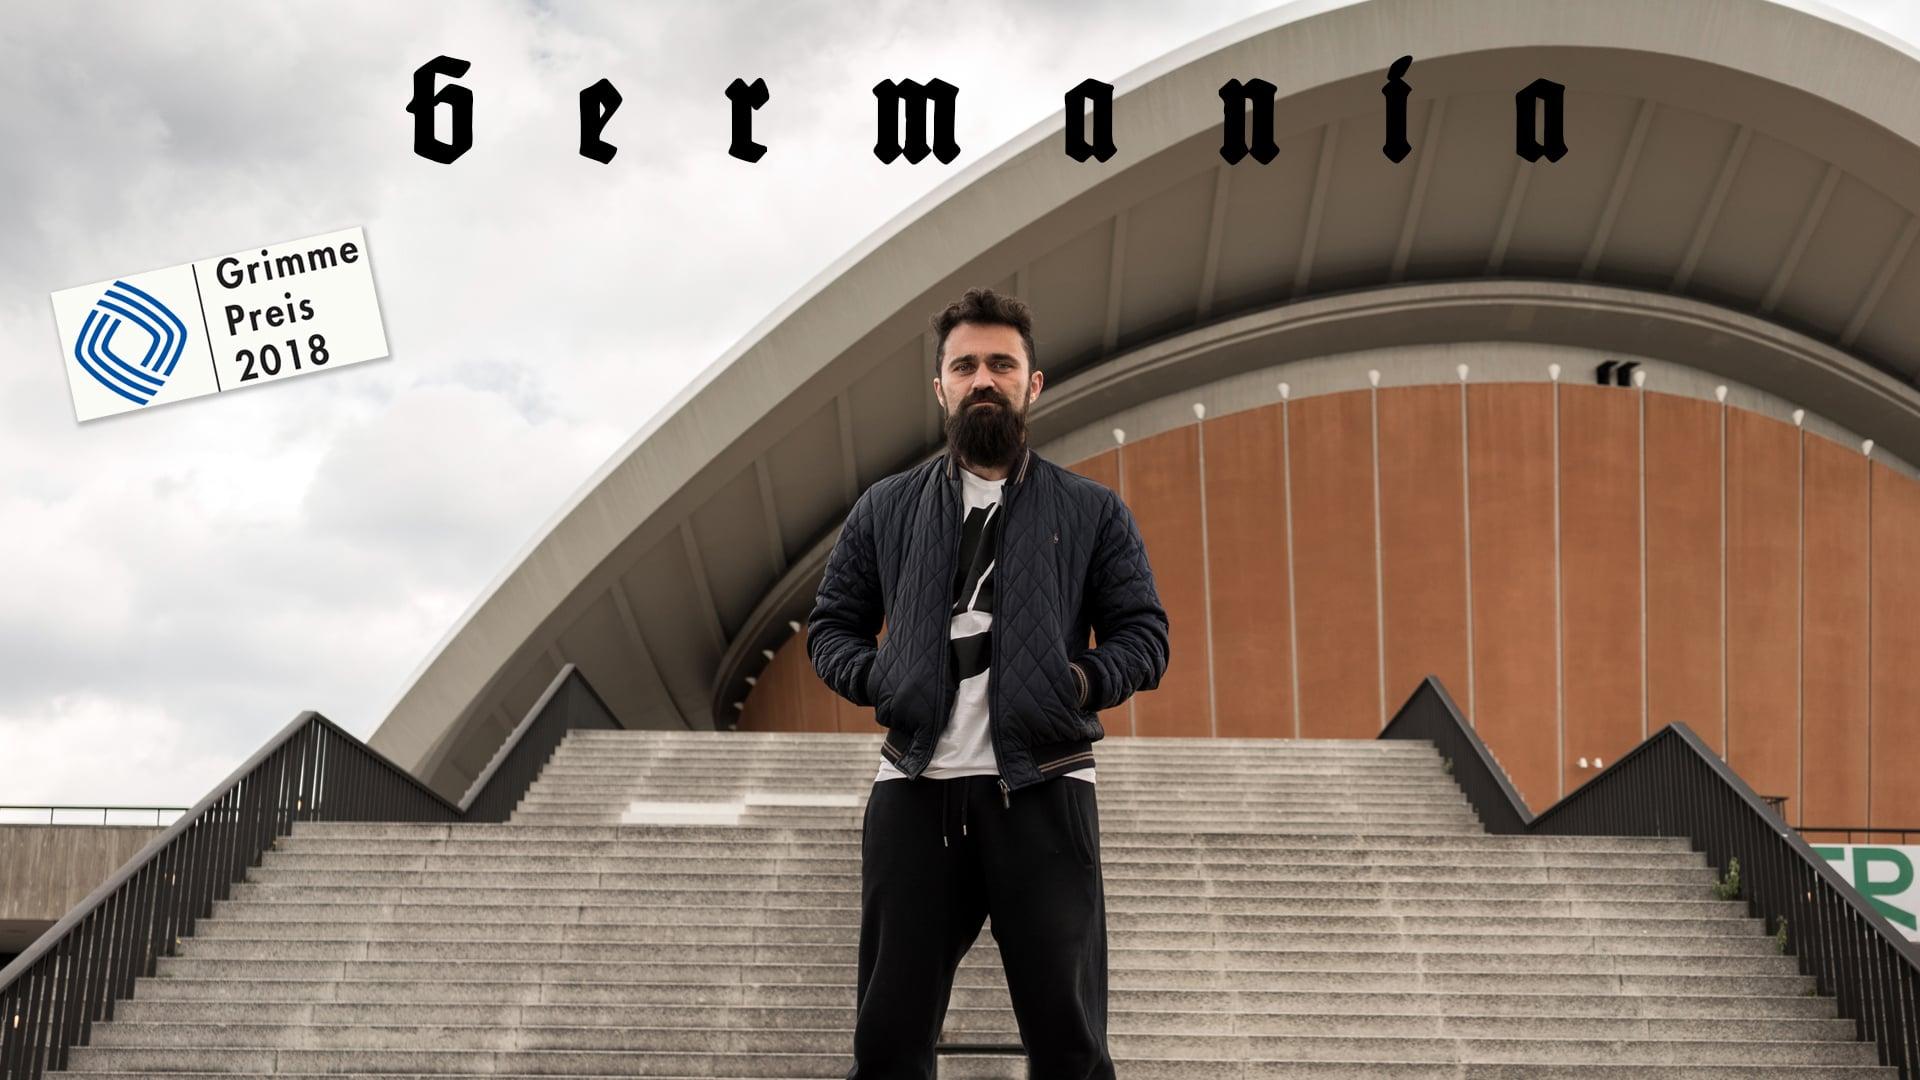 GERMANIA - TEASER